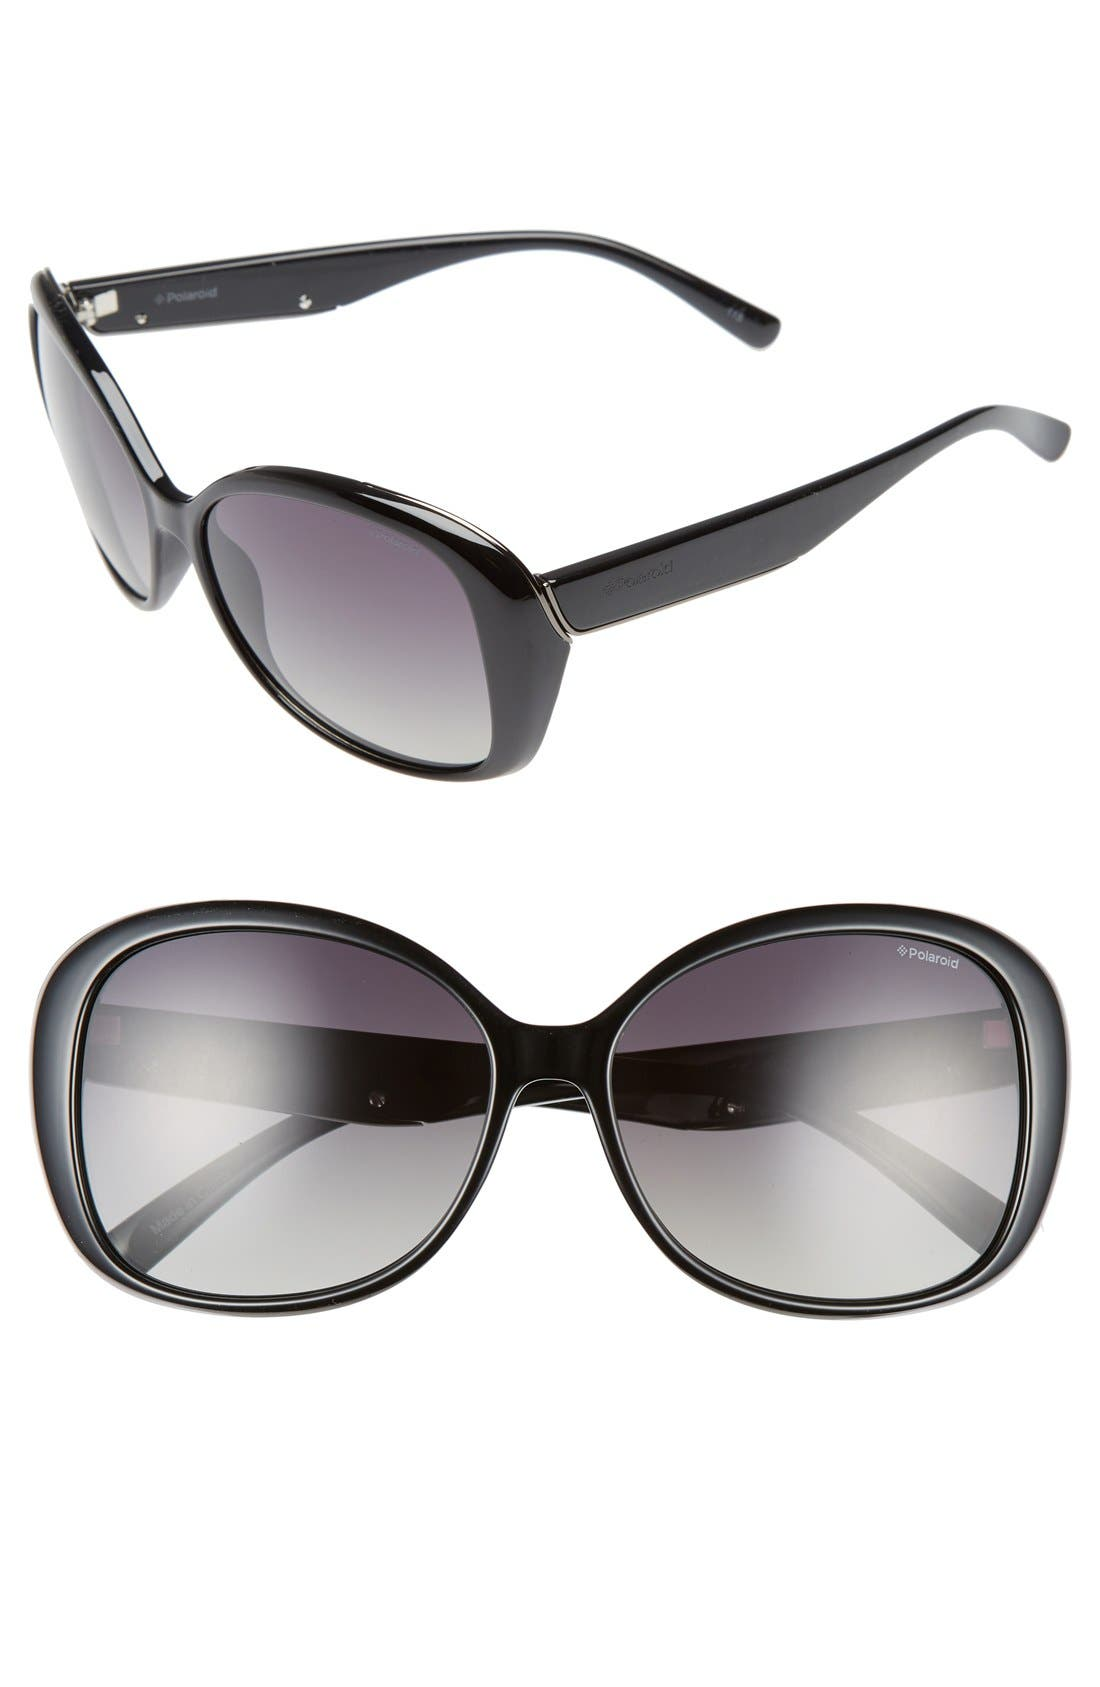 59mm Polarized Sunglasses,                             Main thumbnail 1, color,                             Shiny Black/ Green Polarized